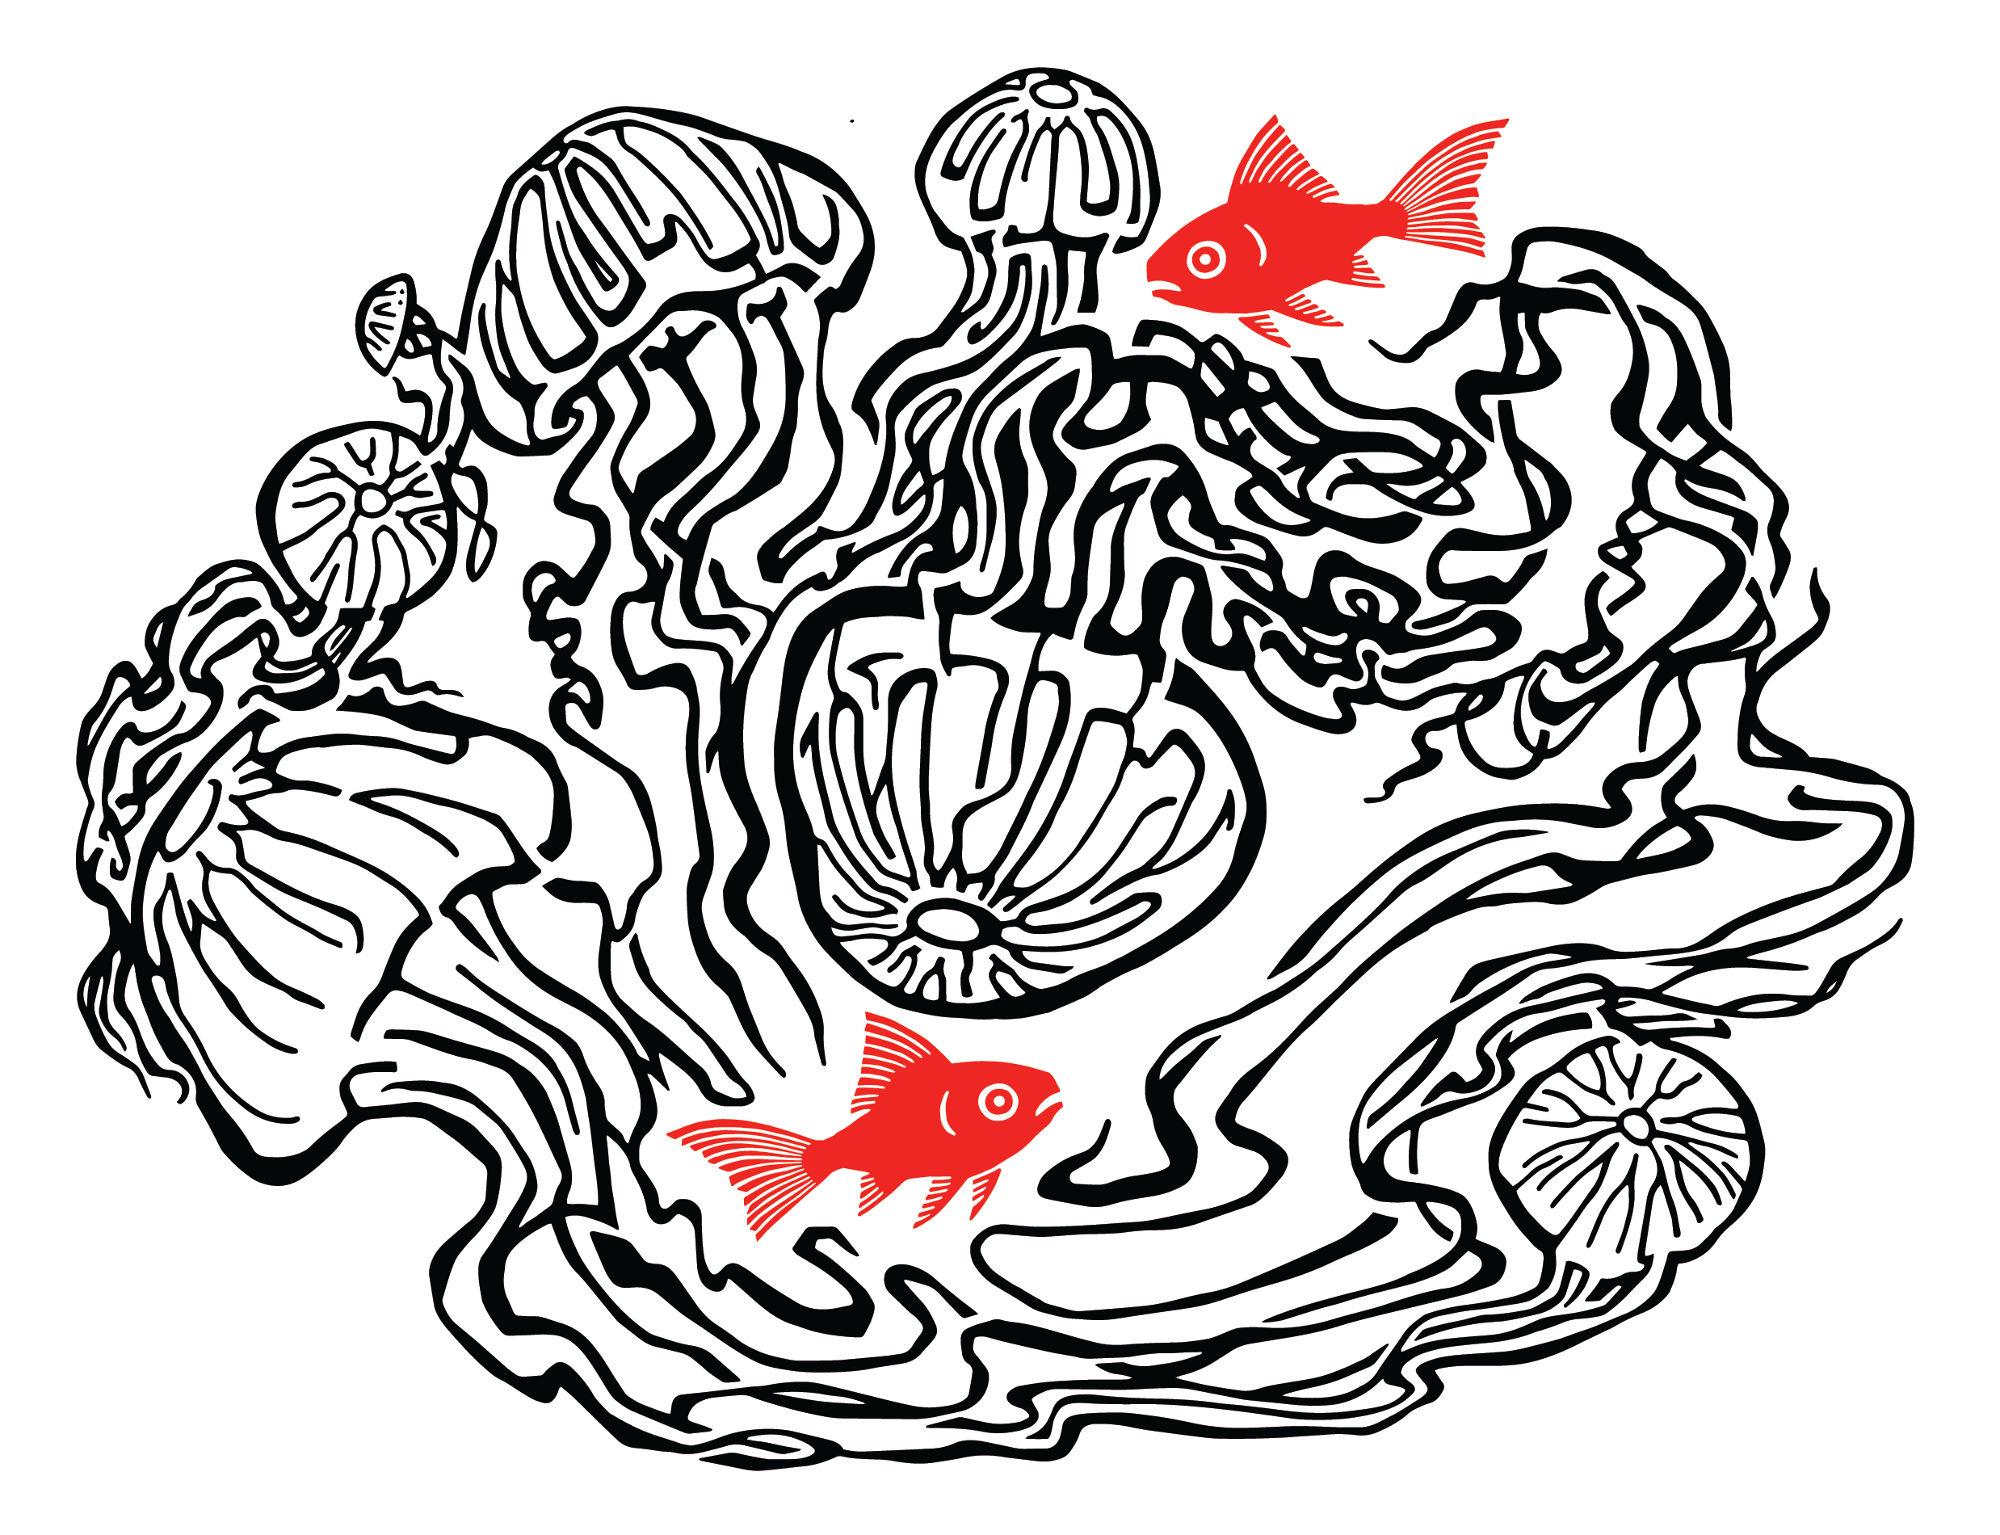 The Jellyfish Maze